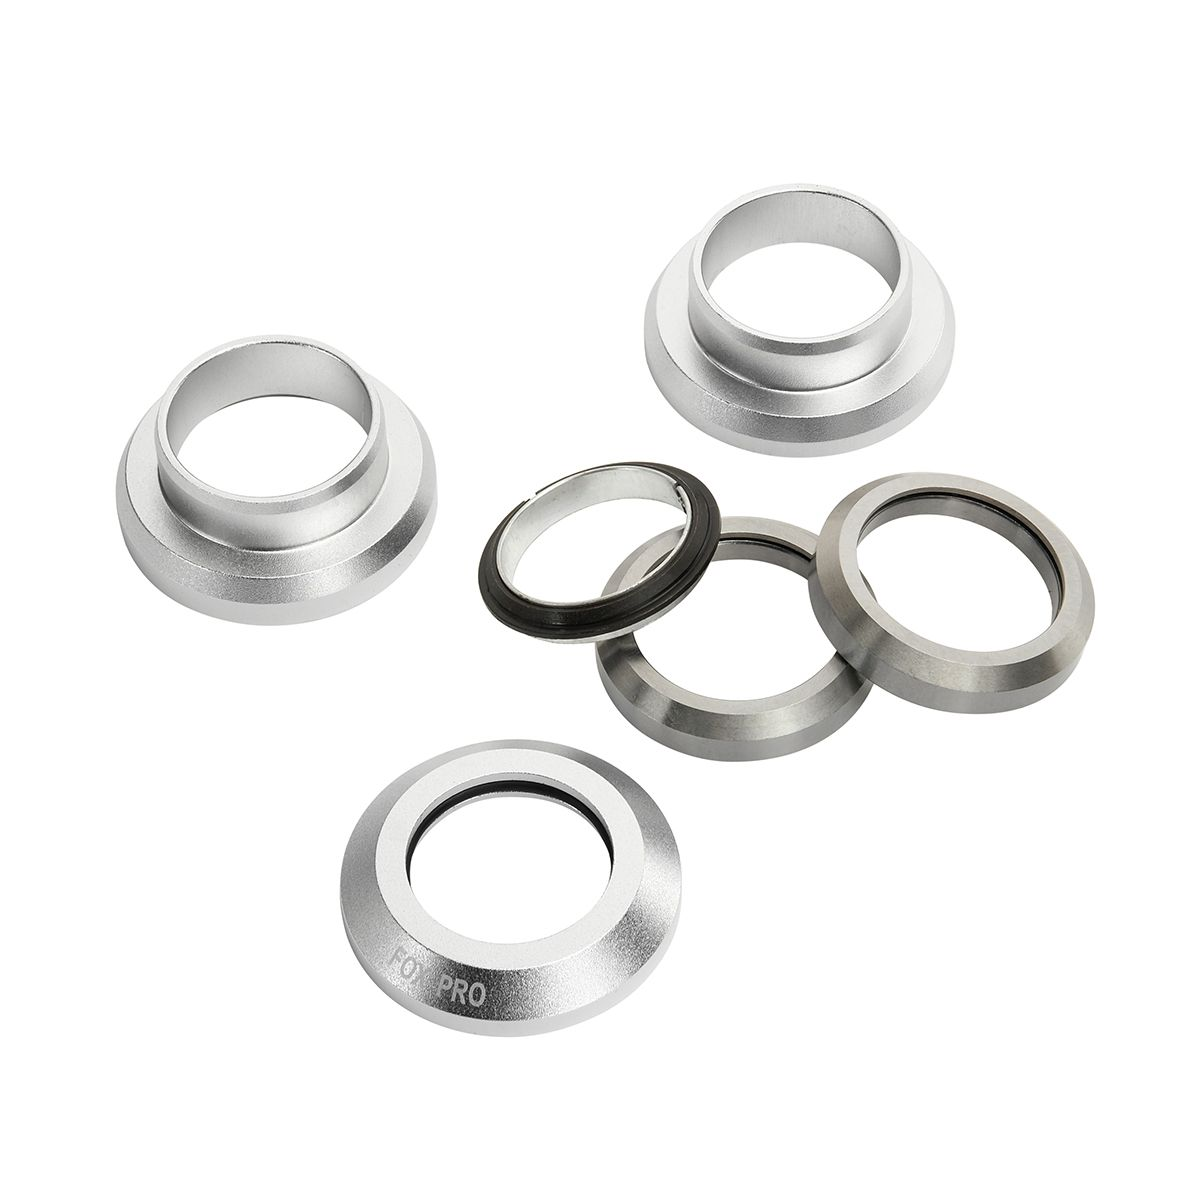 Рулевая колонка Fox стандарт 1 1/8 silver